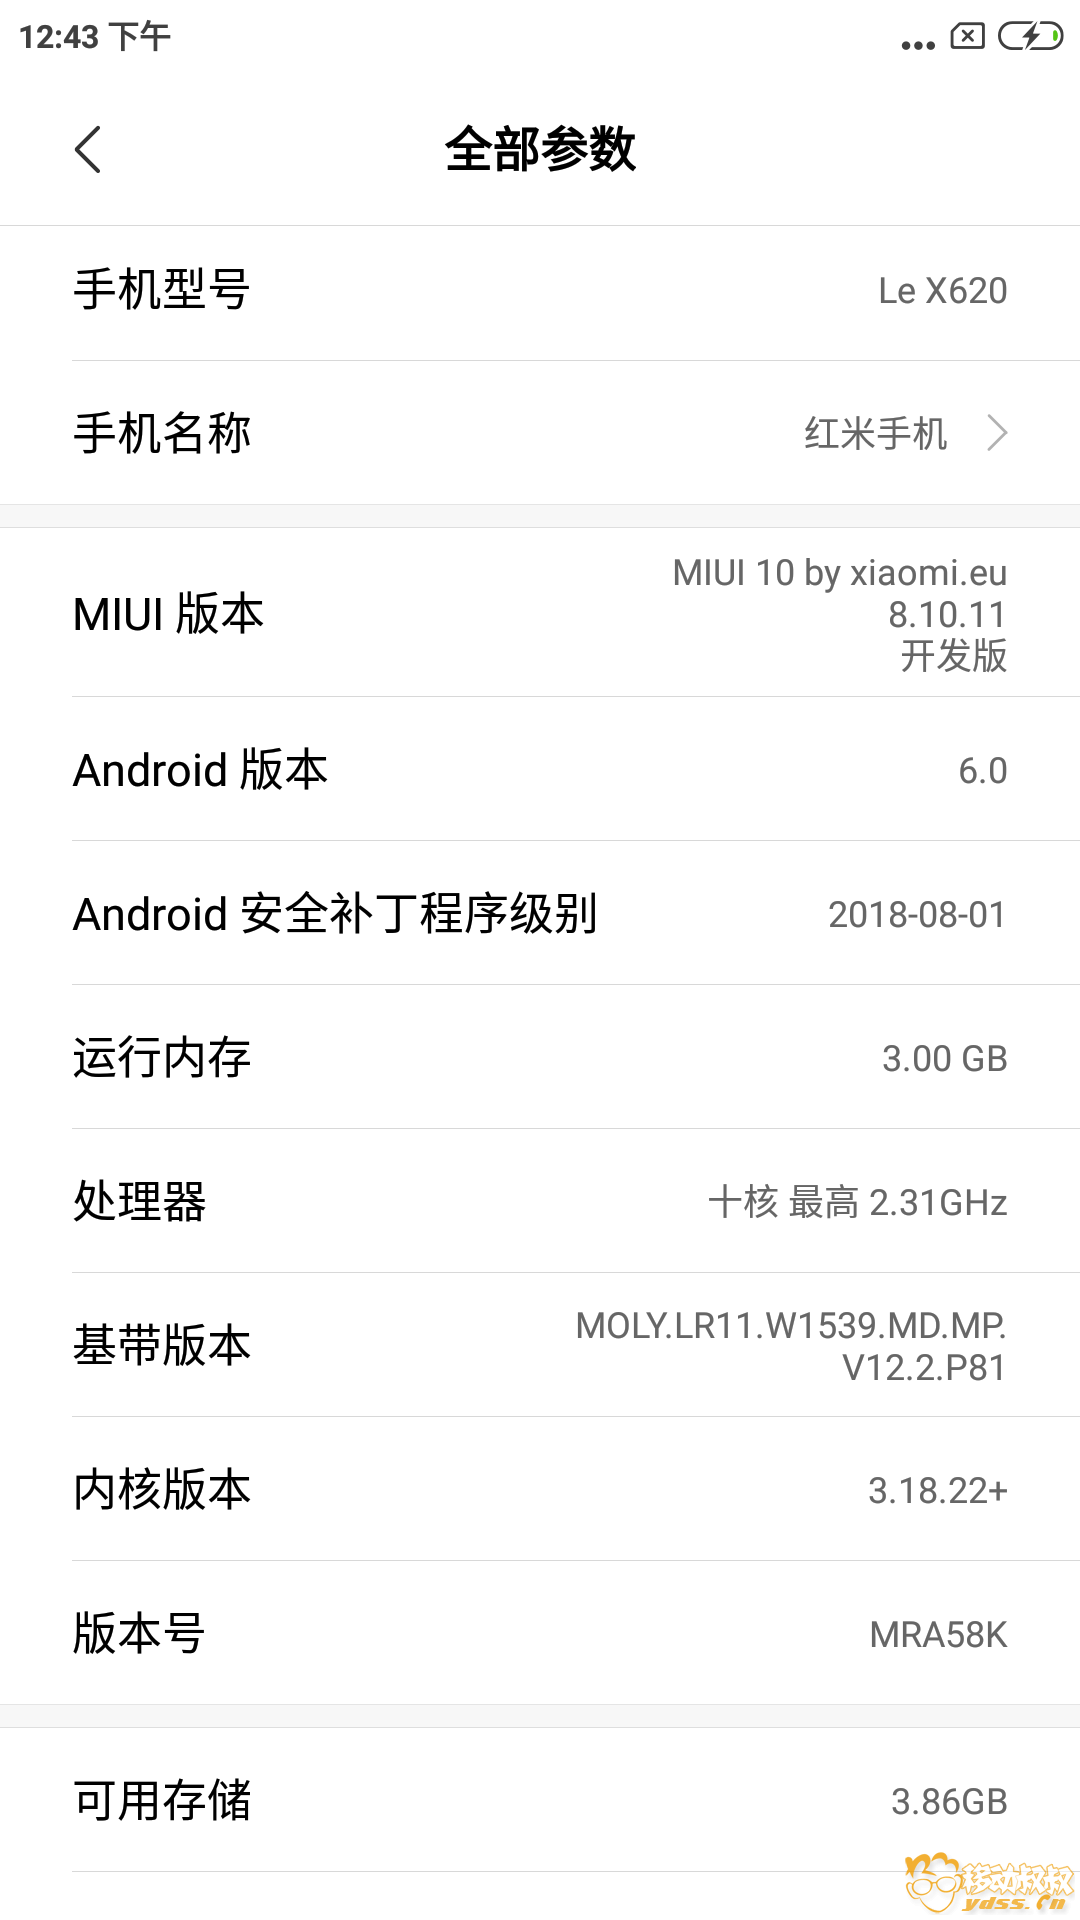 Screenshot_2018-10-11-12-43-39-747_com.android.settings.png